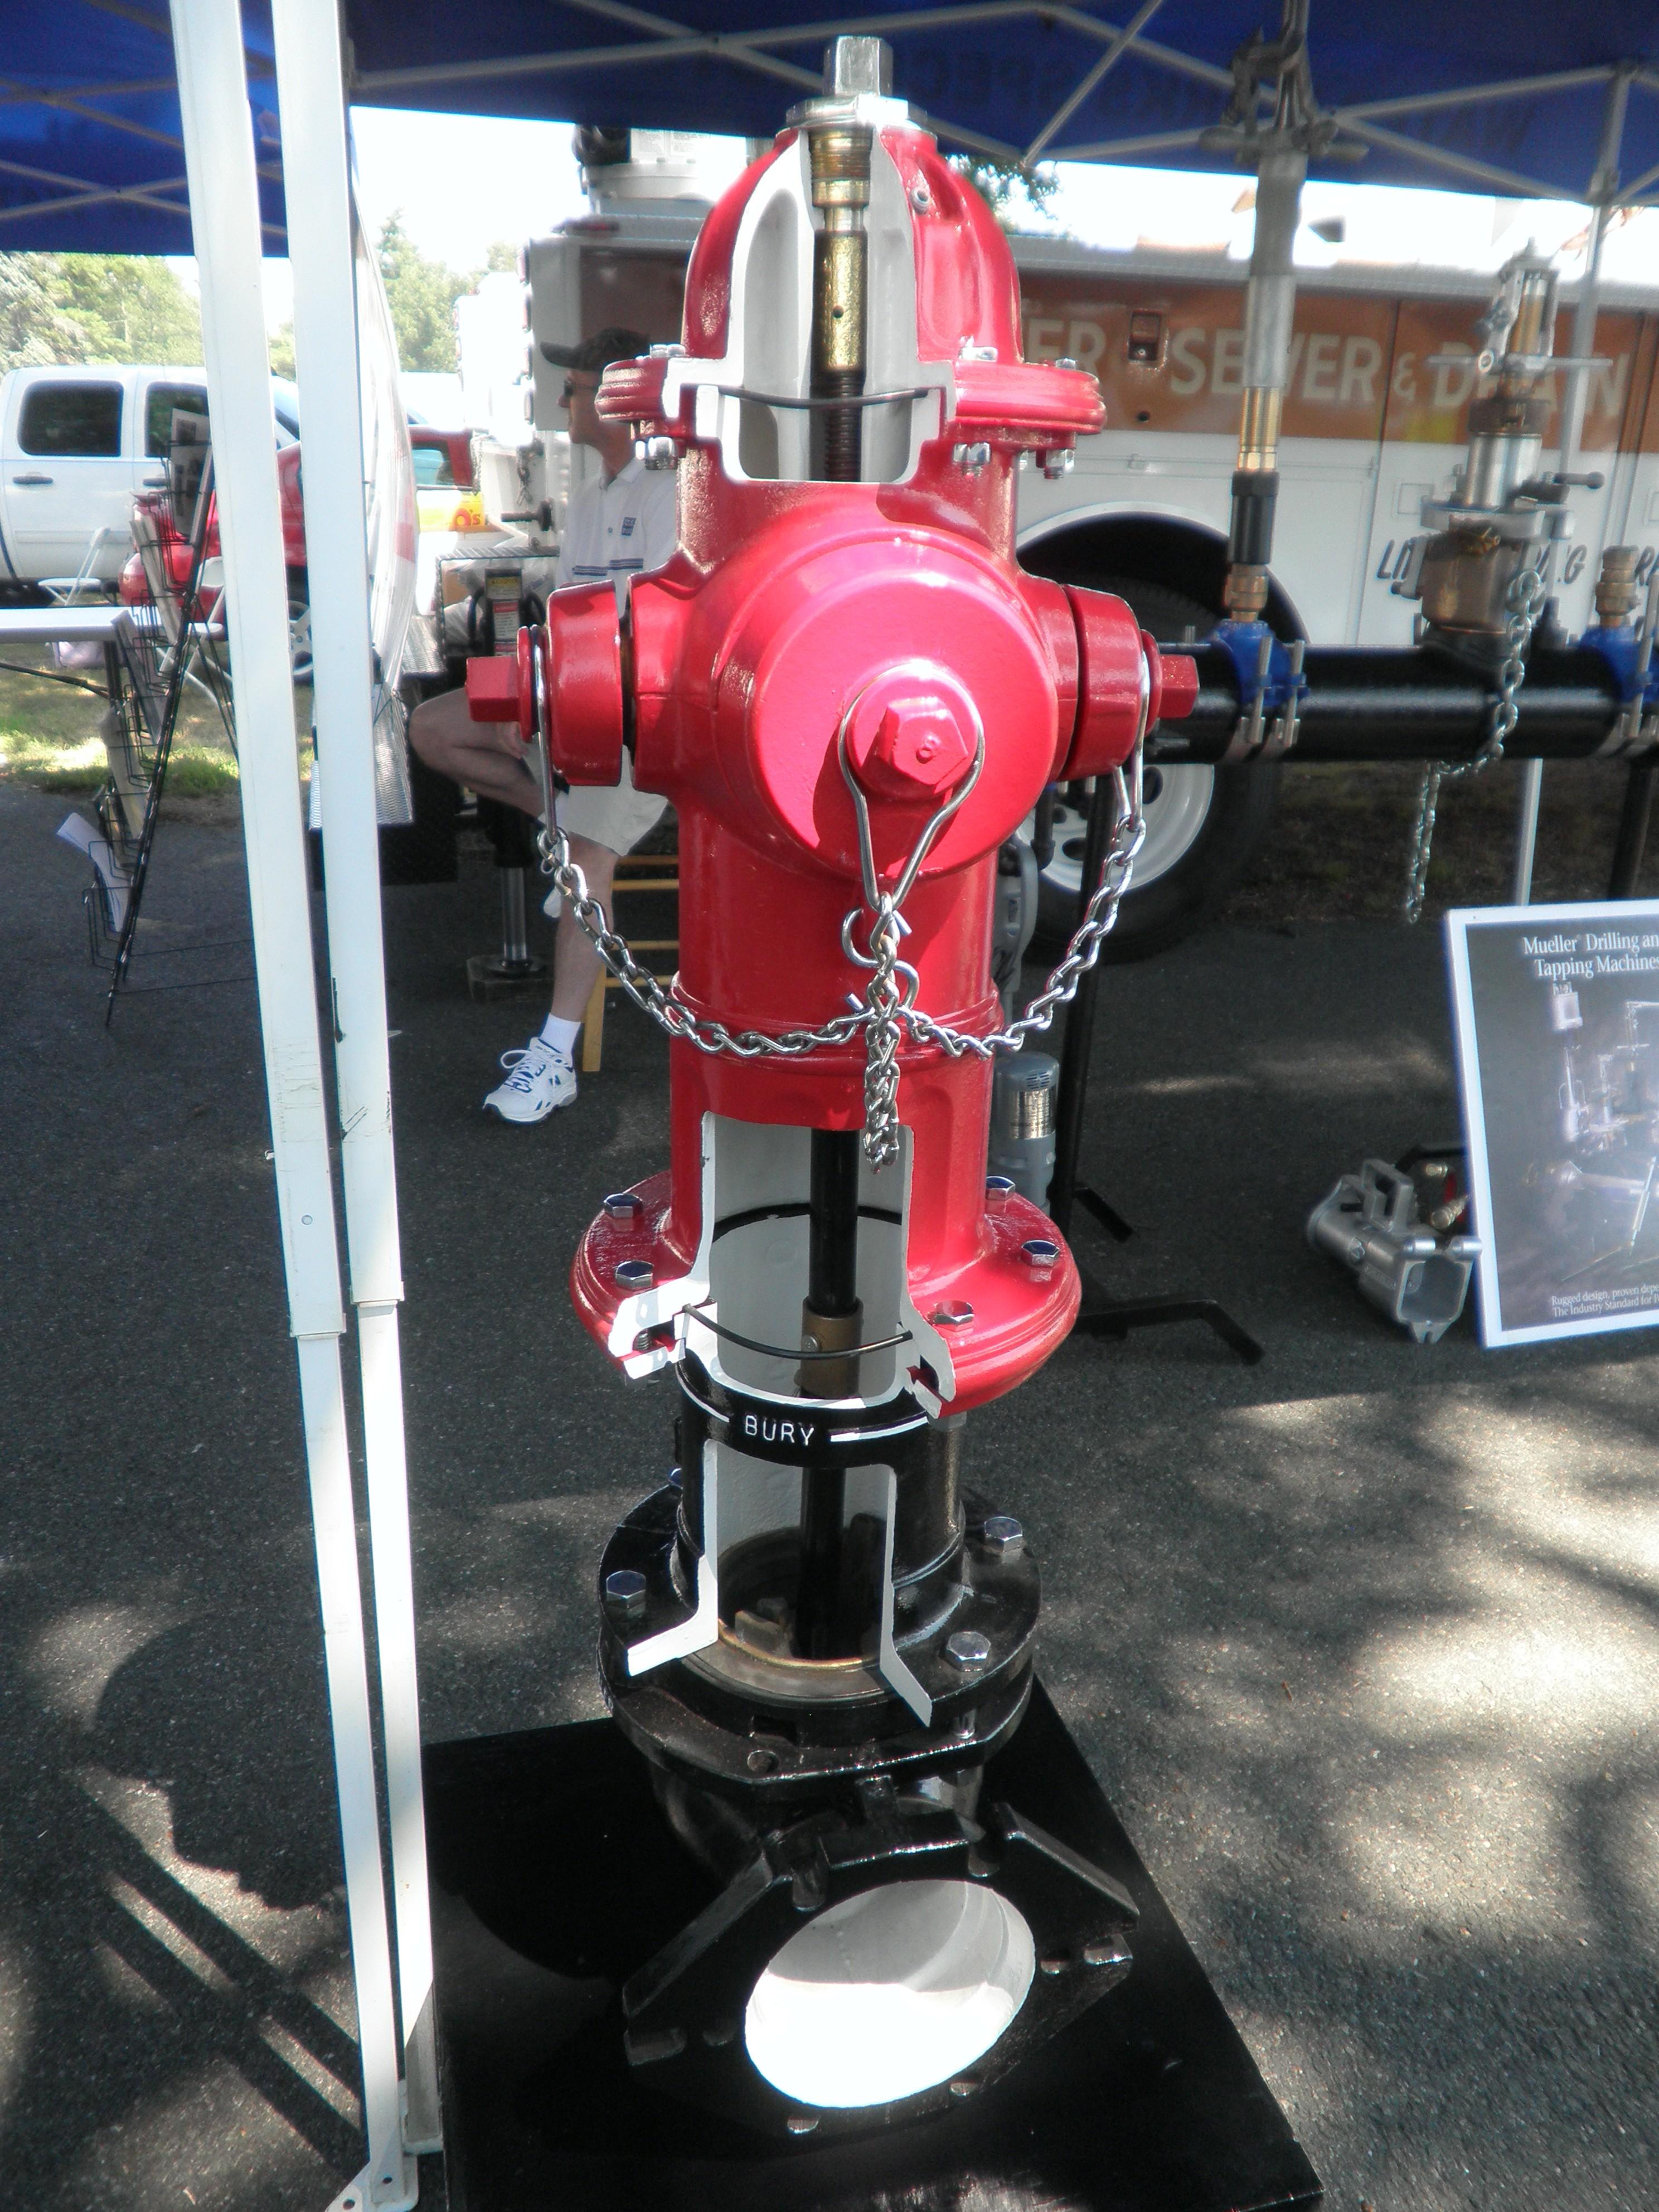 Clow Fire Hydrant Repair Tools